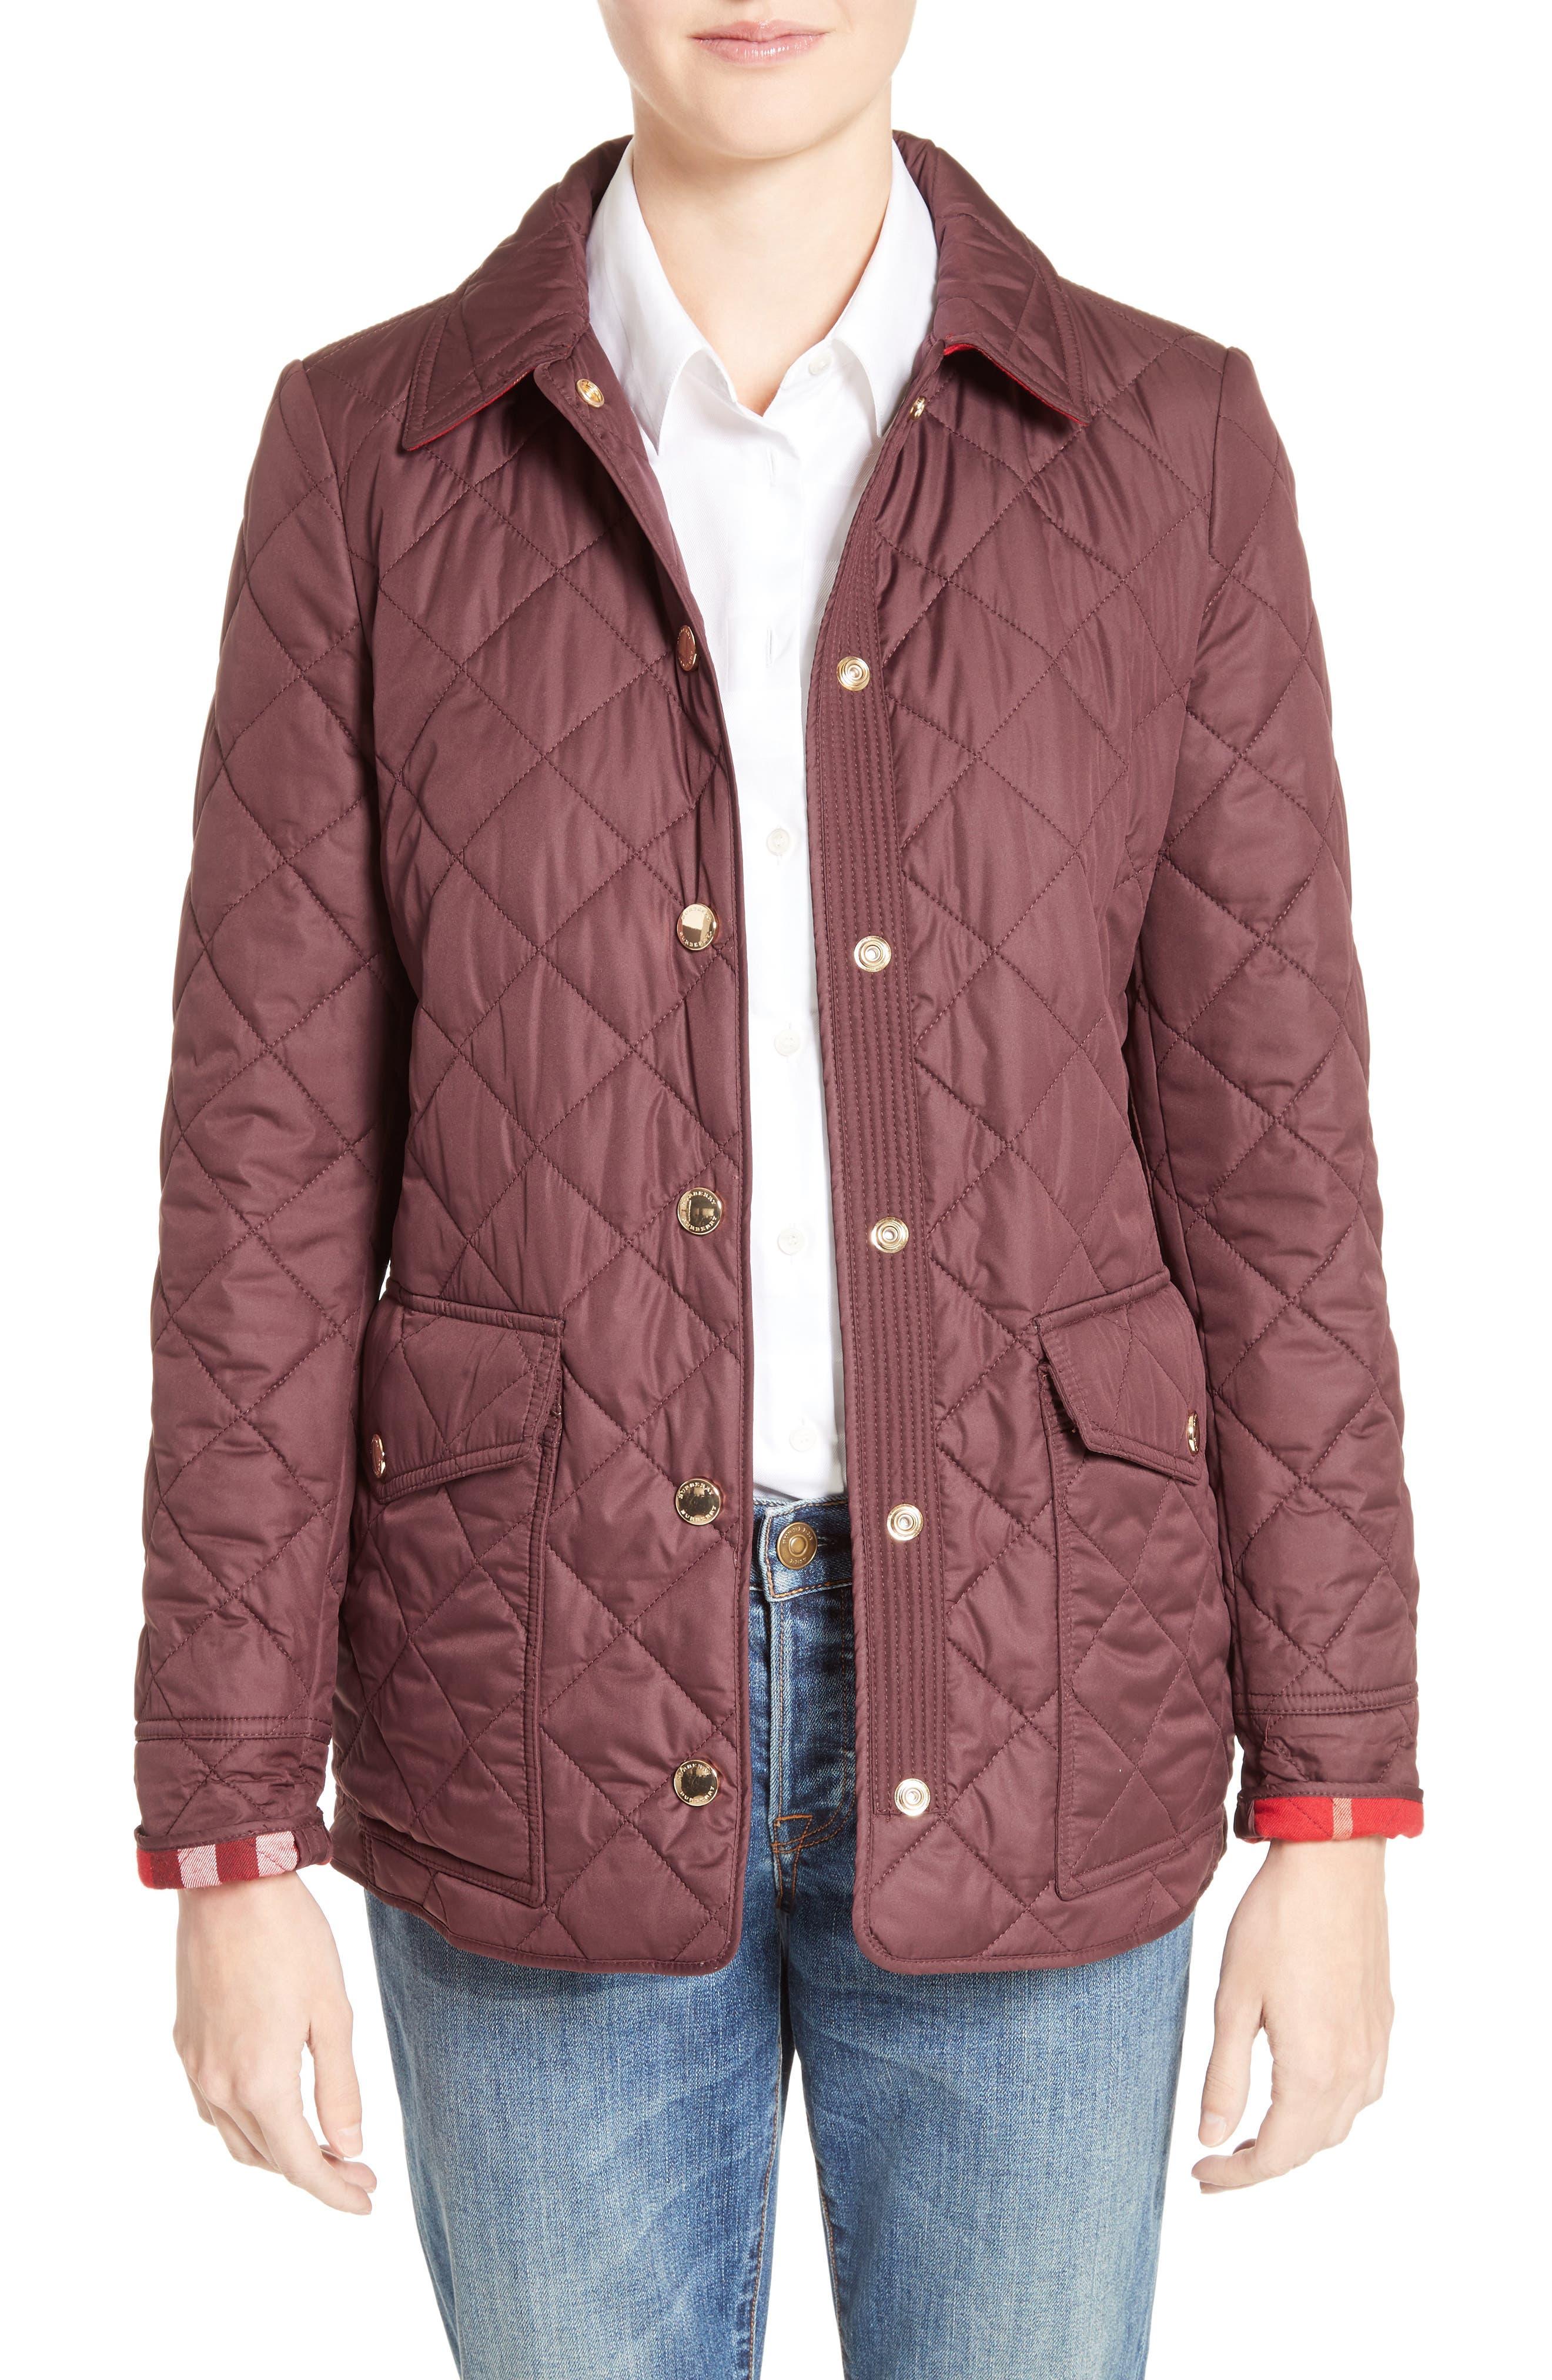 Westbridge Quilted Jacket,                         Main,                         color, Burgundy